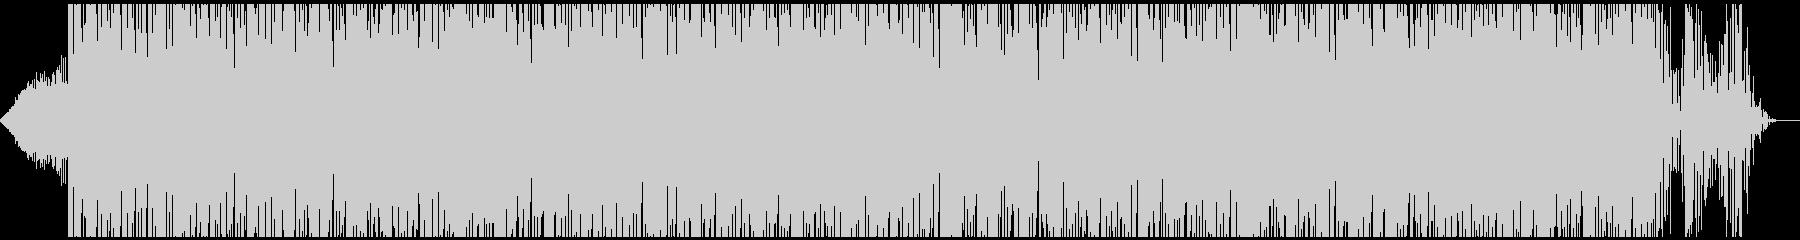 EDMクラブ系、製品紹介、商品紹介-01の未再生の波形